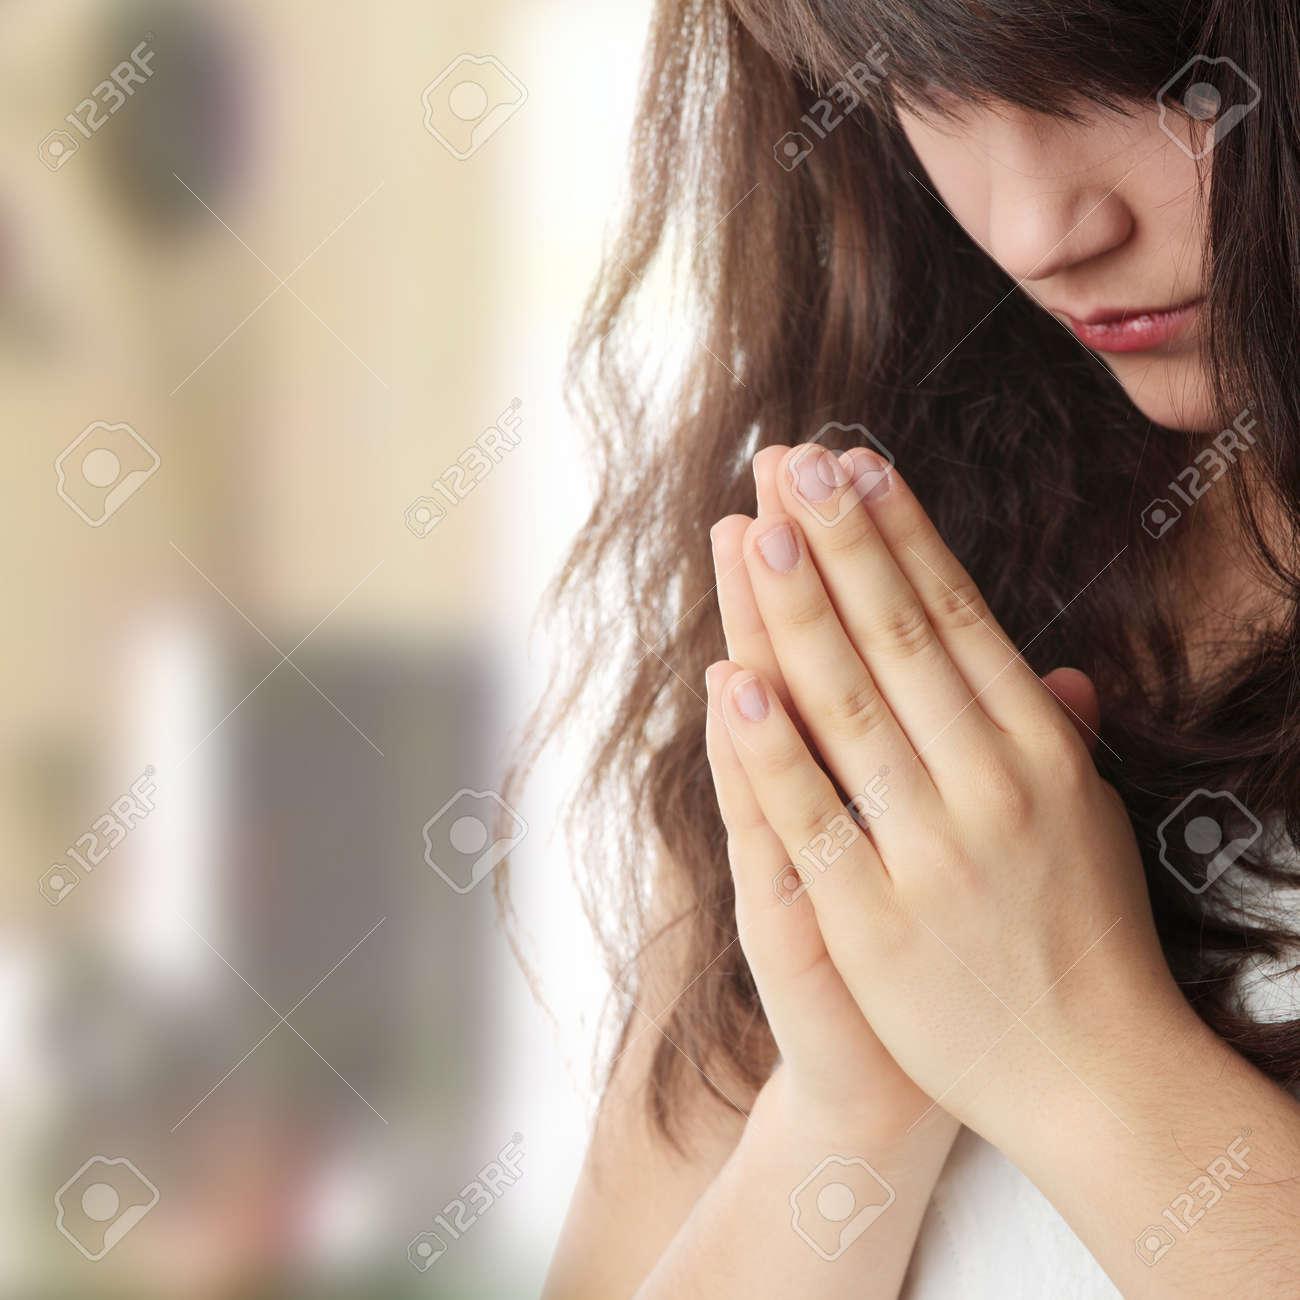 Closeup portrait of a young caucasian woman praying Stock Photo - 6932604